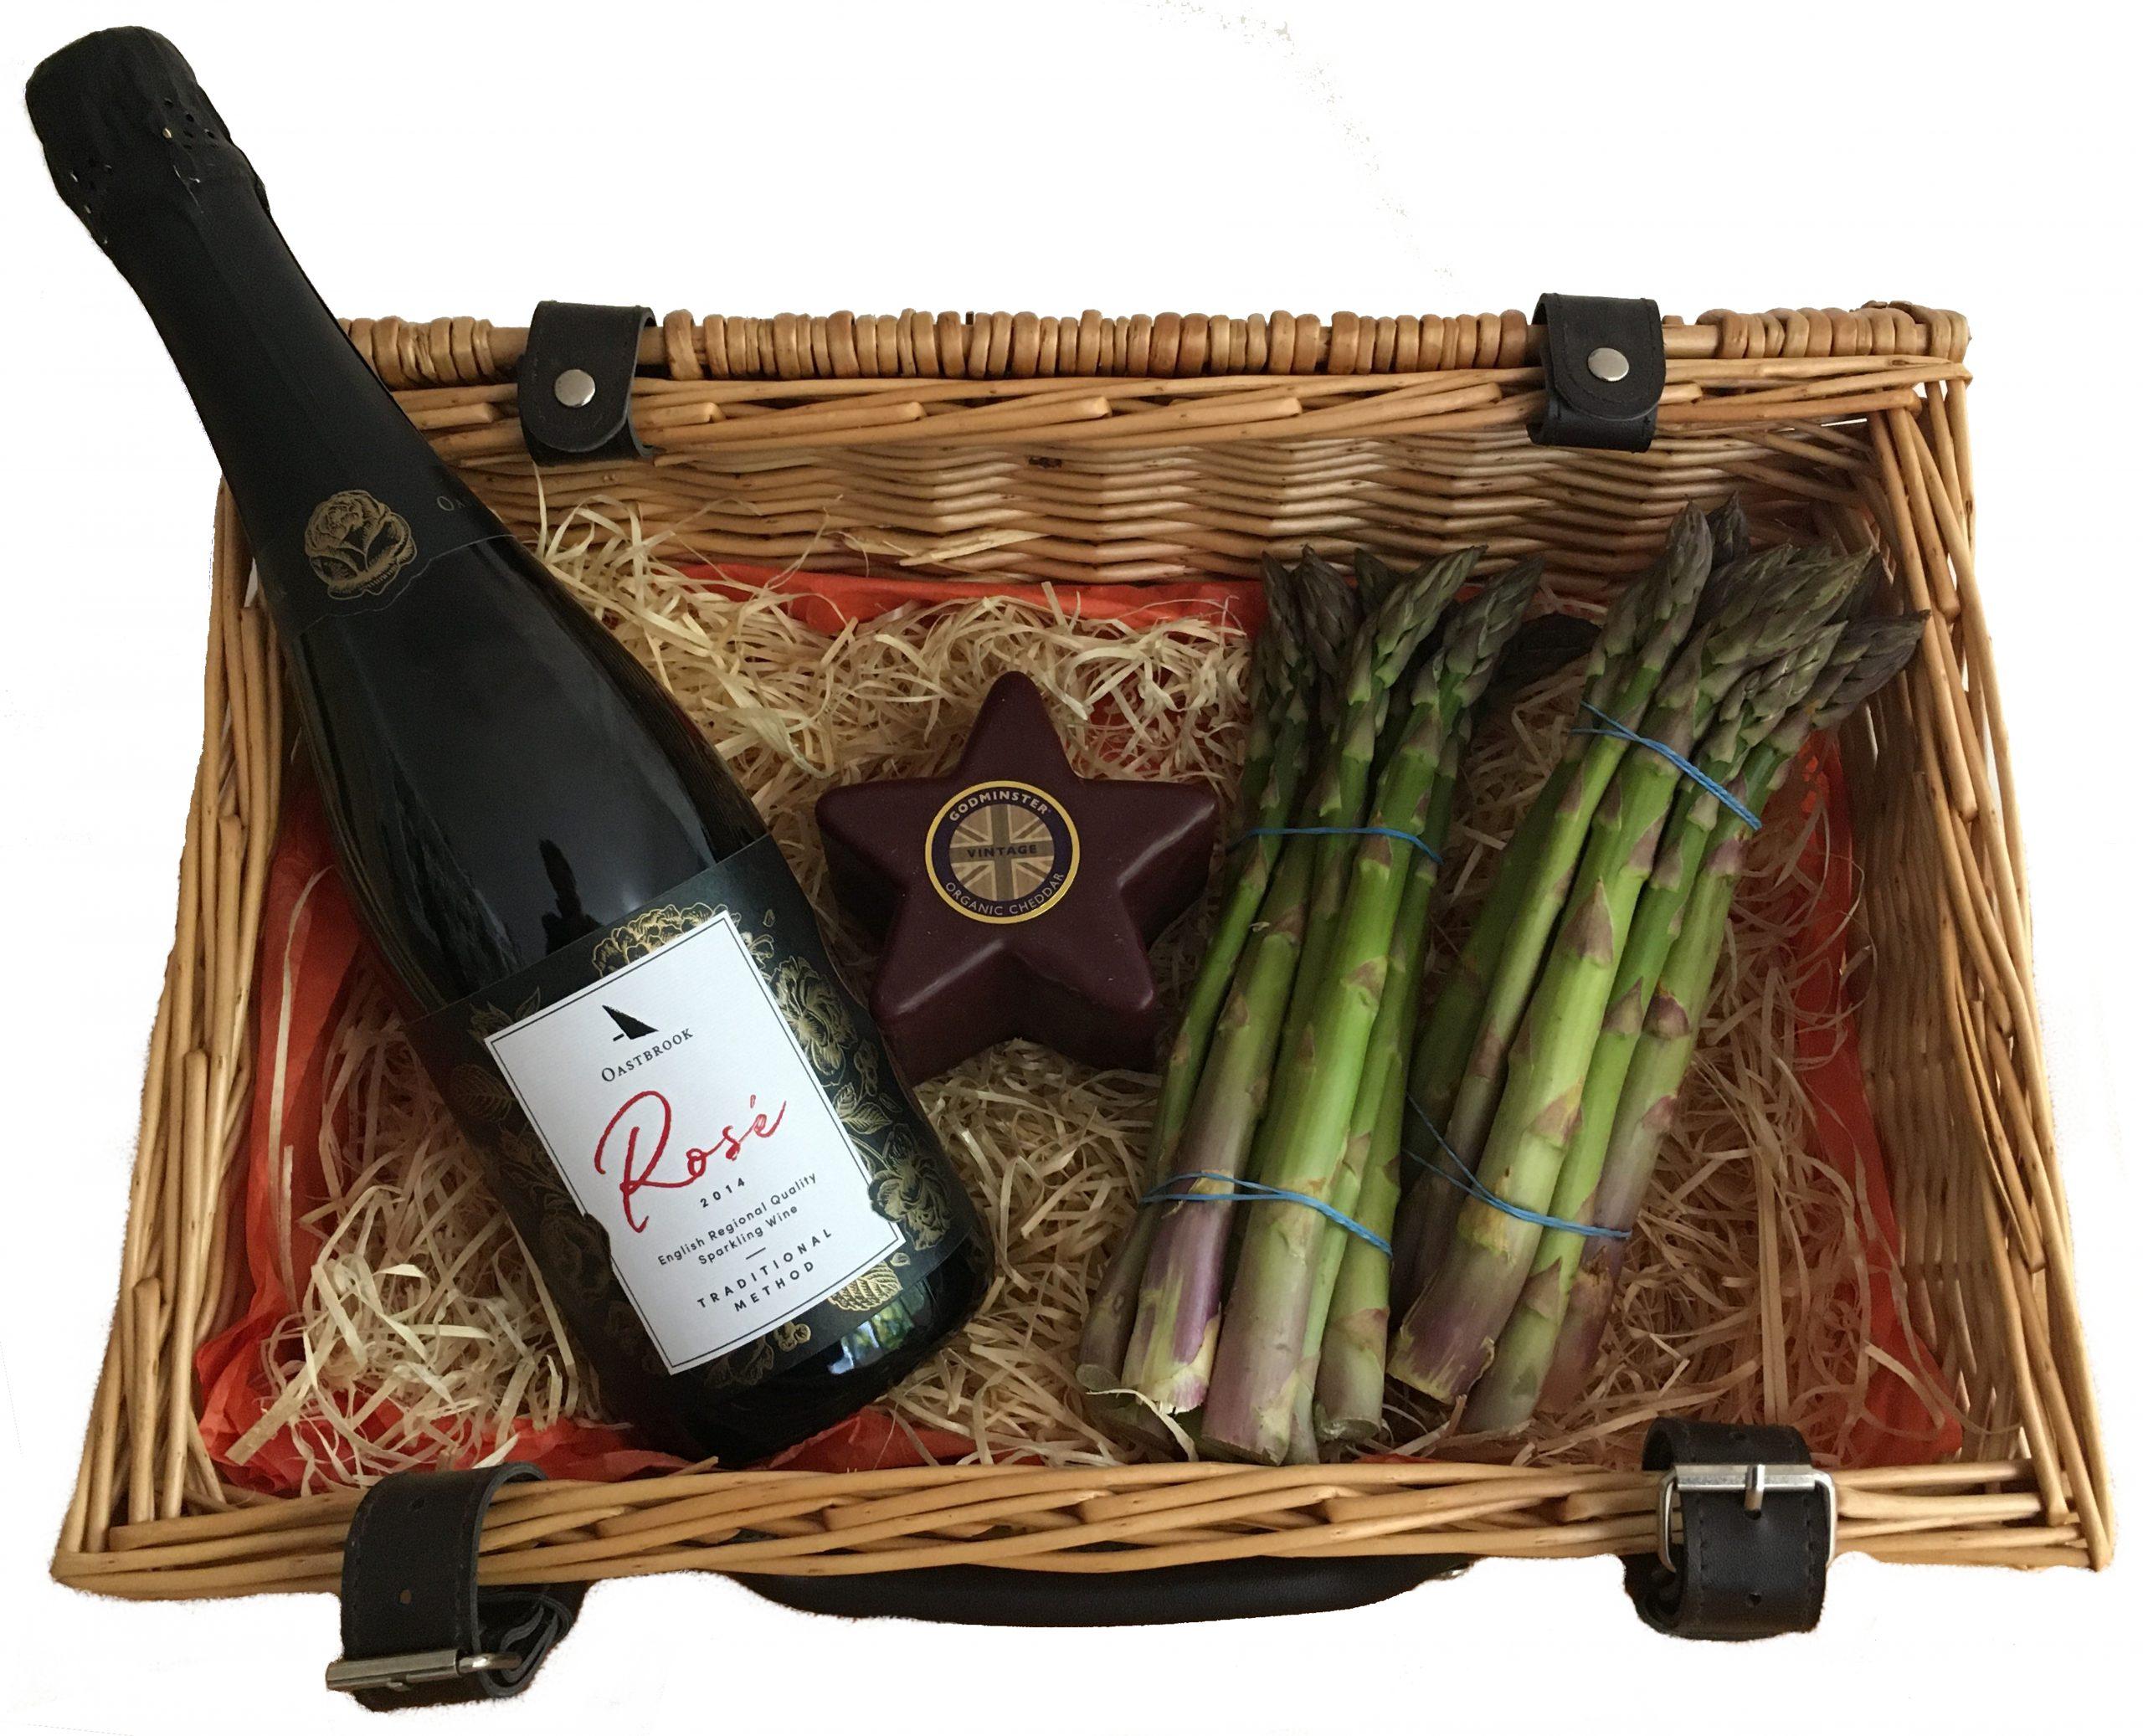 Vineyard and wine merchant launch luxury hamper